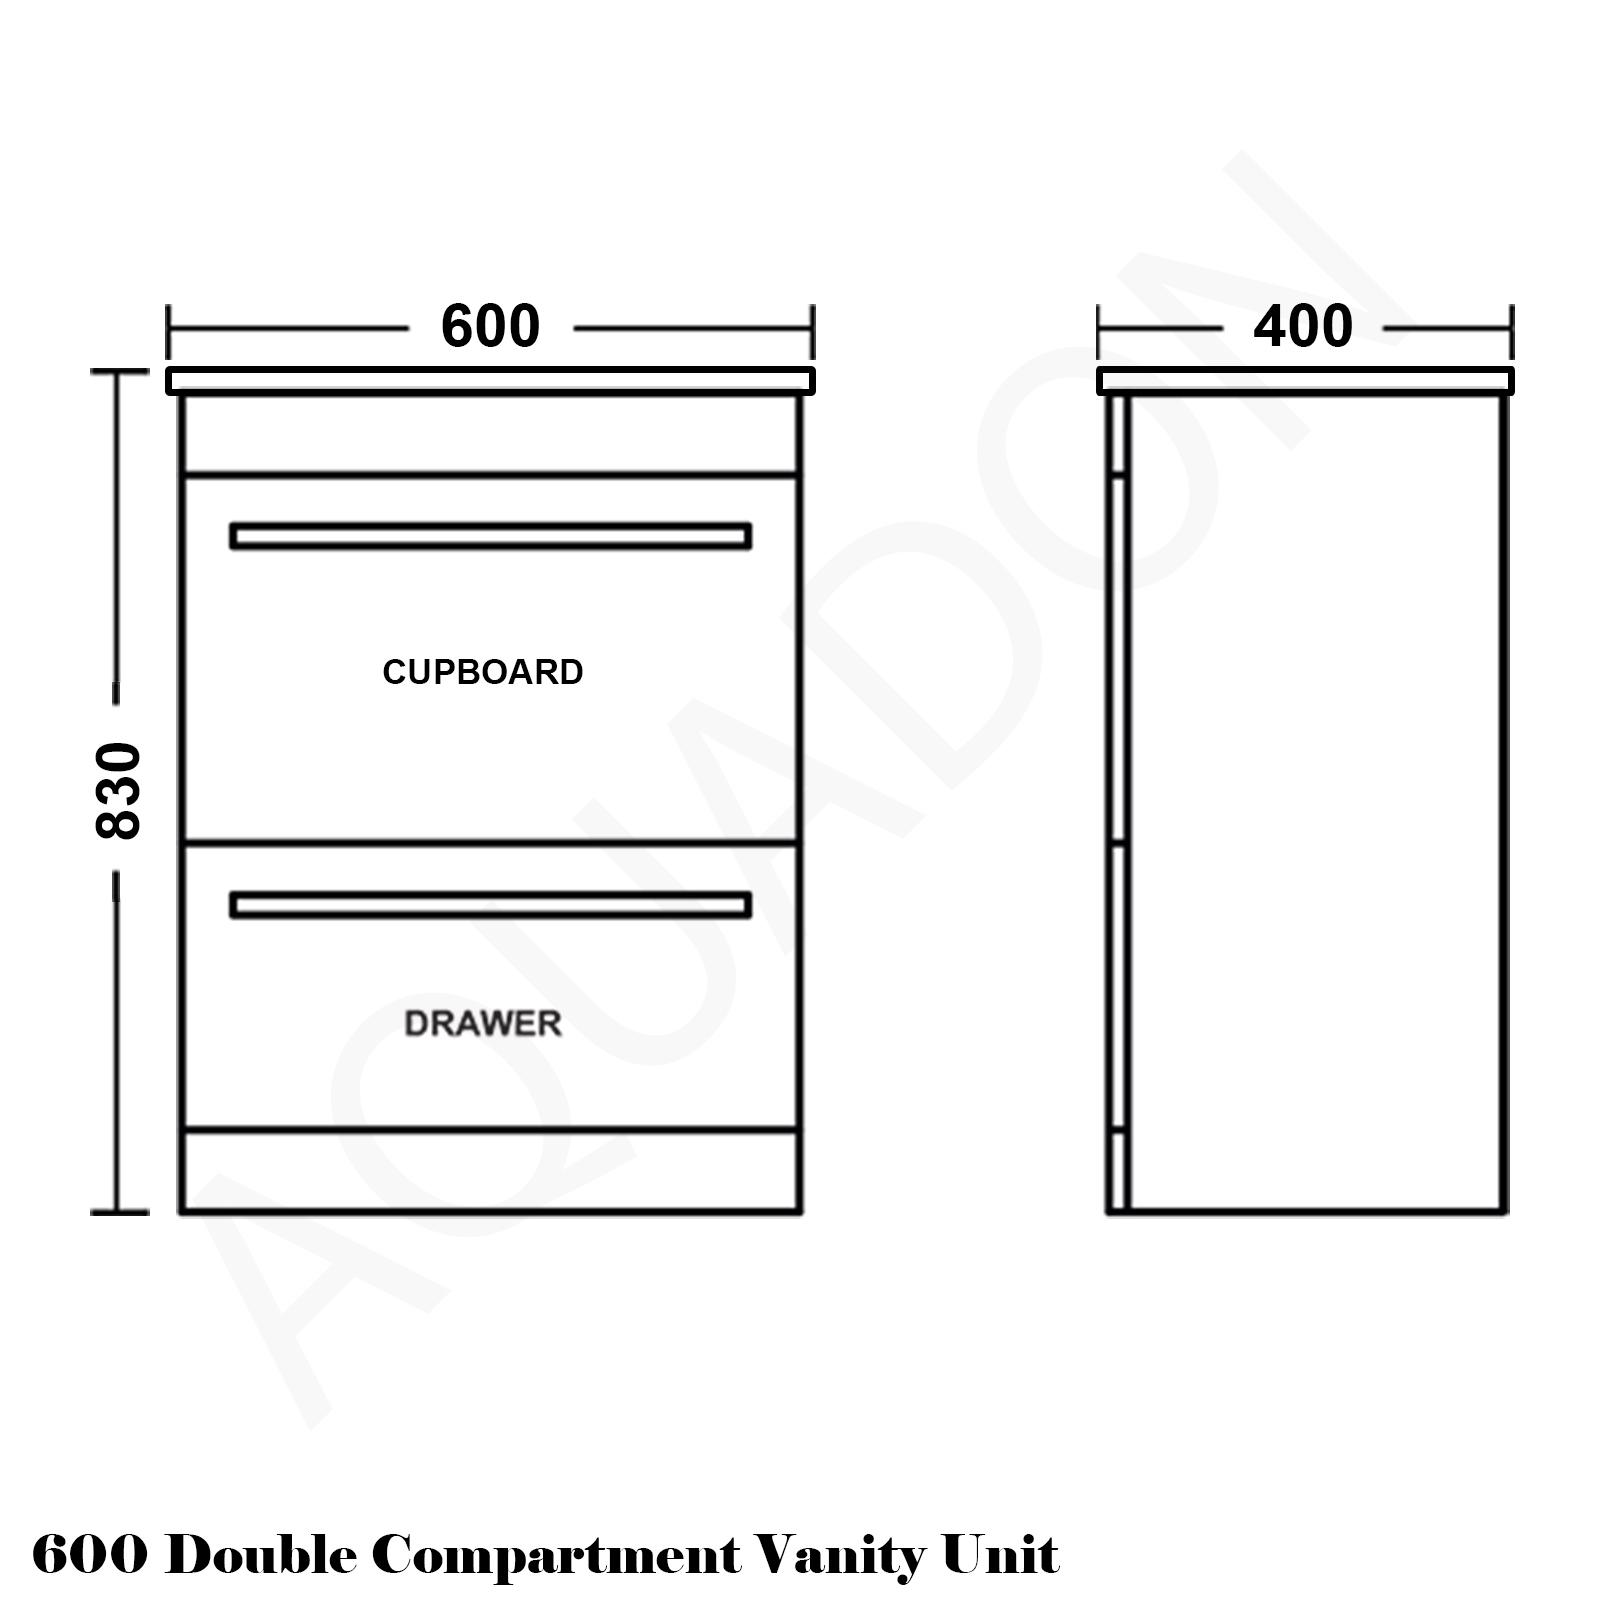 Minimalist gloss white vanity unit 600 800 or 1000mm -  600 Turin Vanity Single Drawer Line Drawing 800